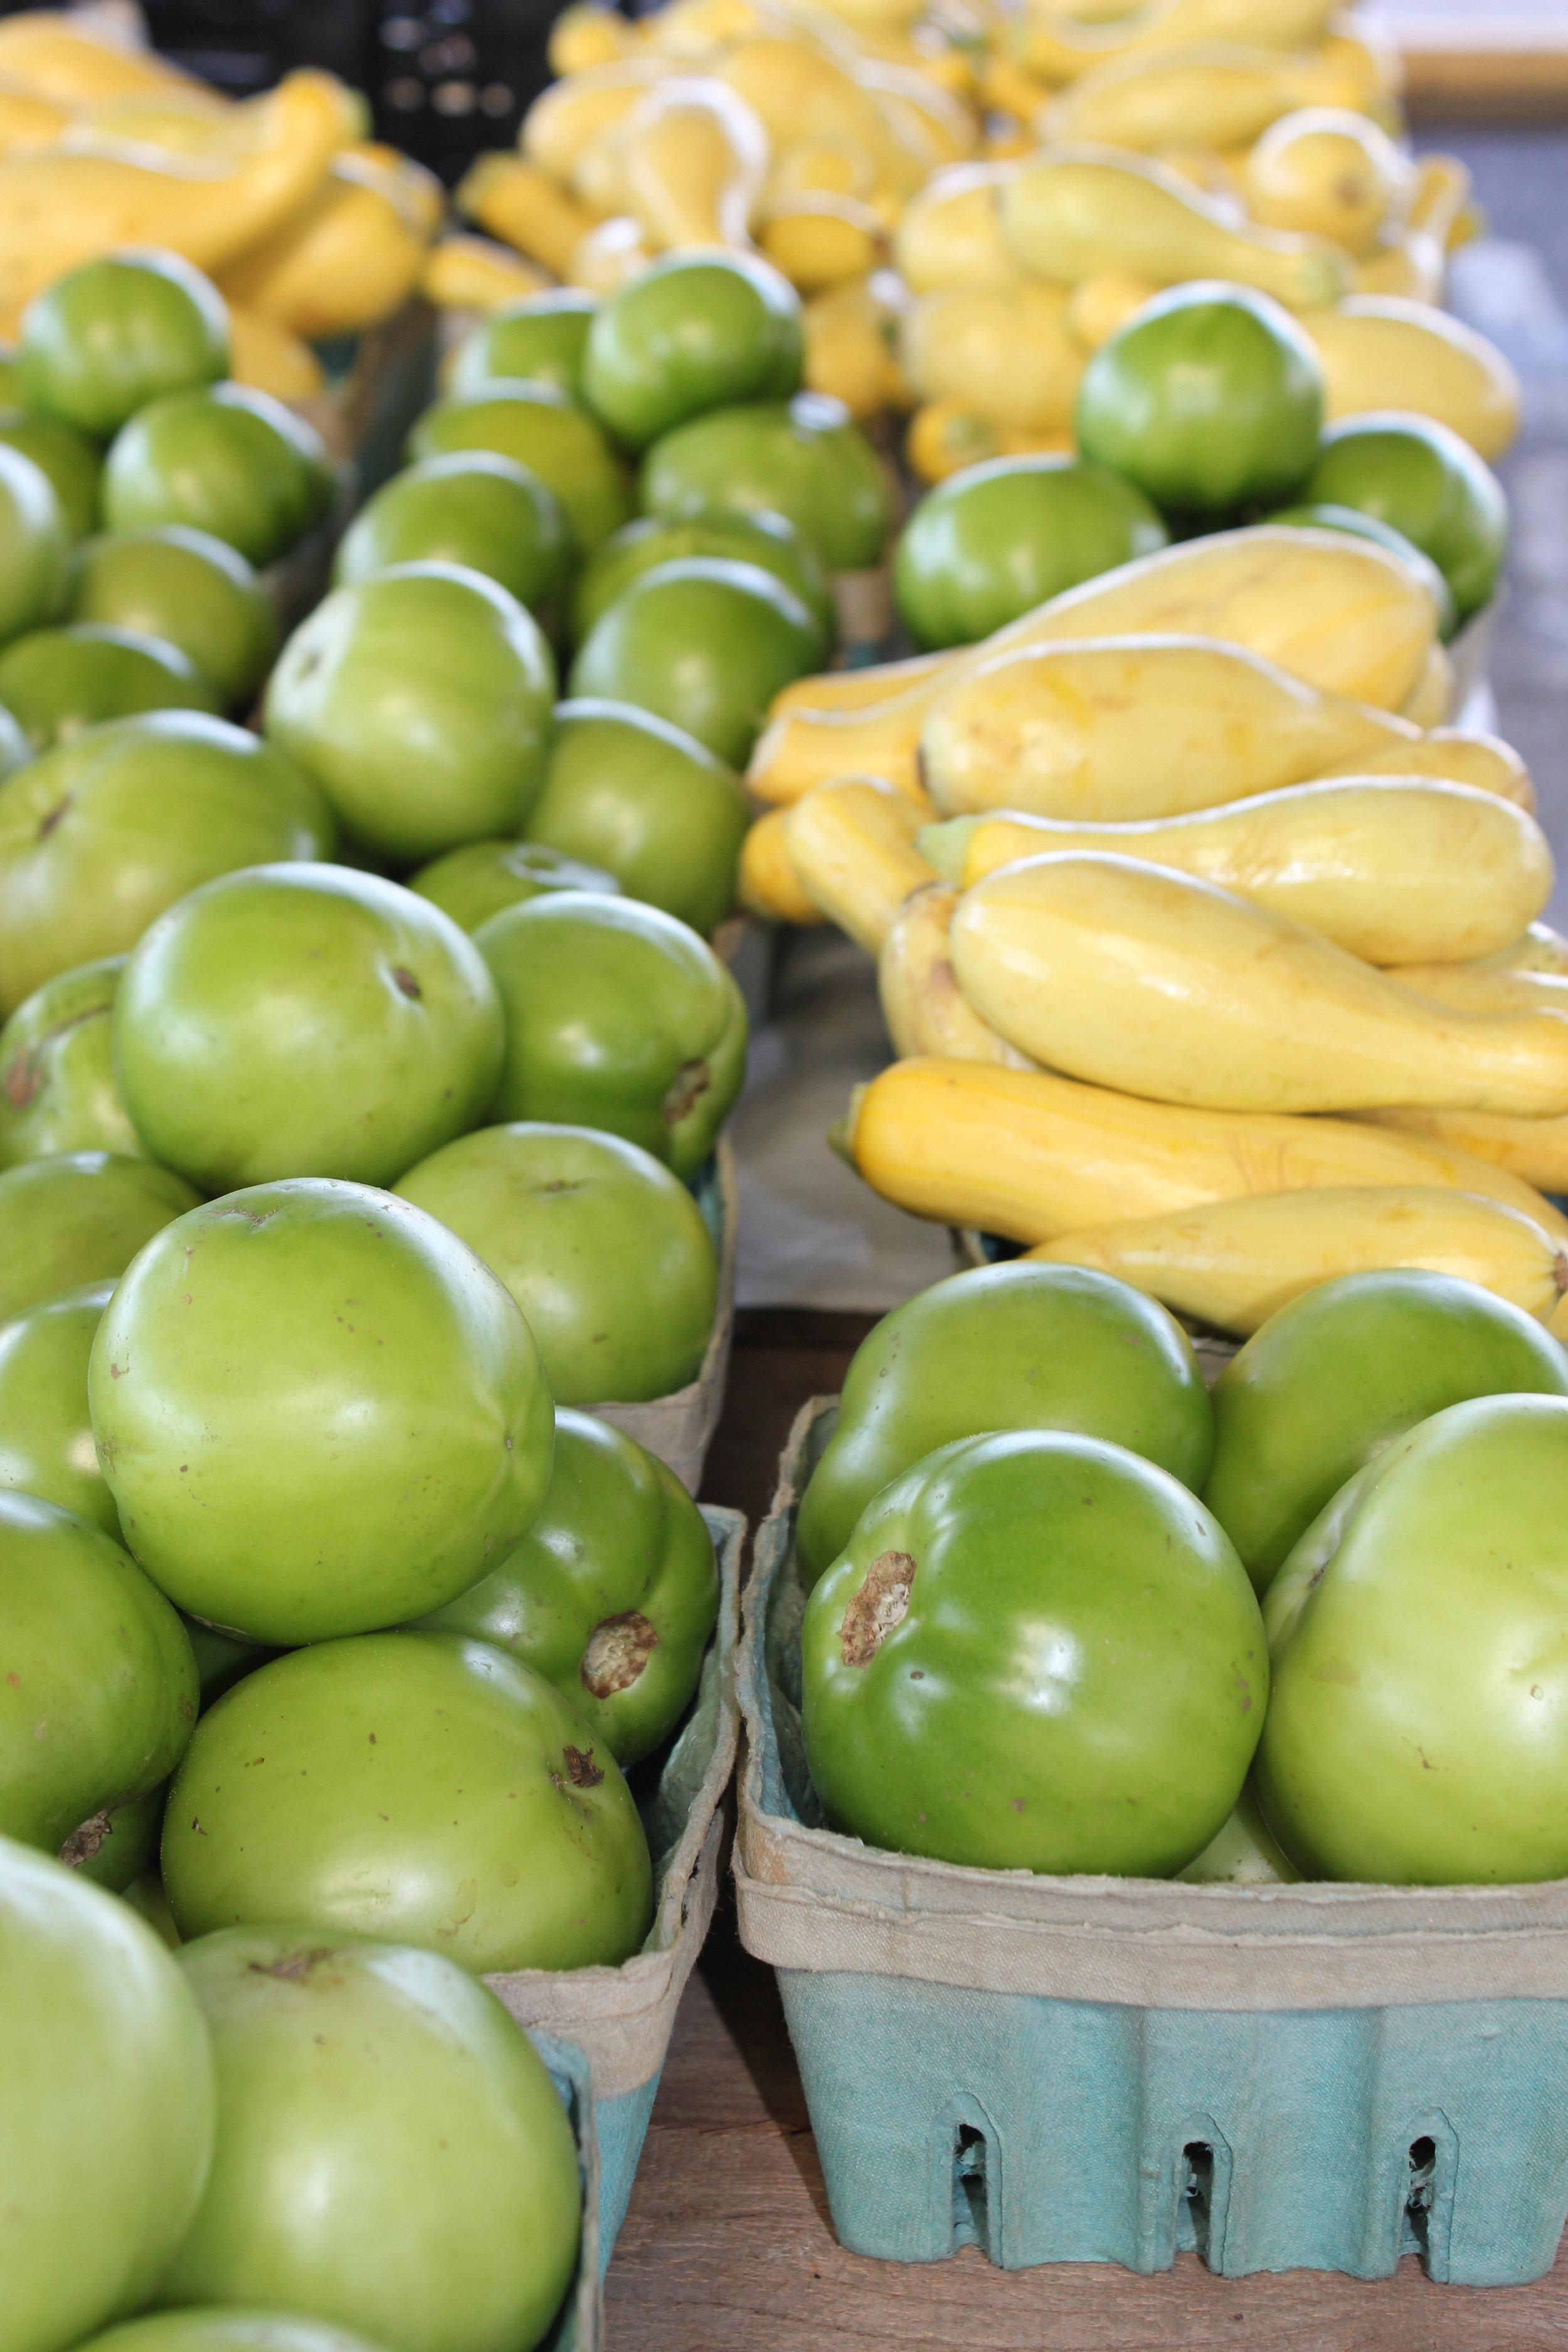 Produce at the Market.JPG